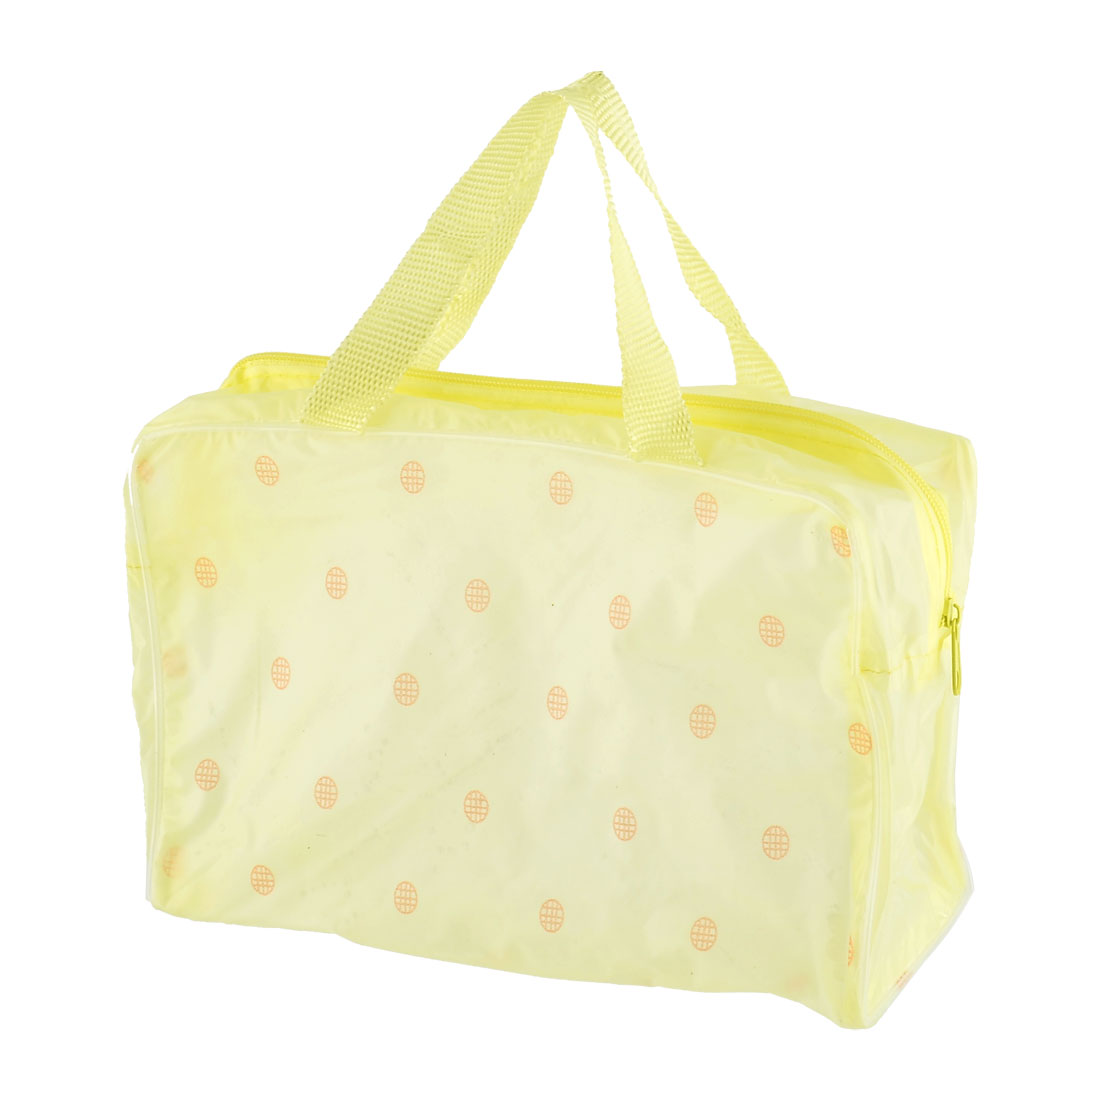 Travel PVC Flower Pattern Wash Bag Storage Holder Pouch Yellow 2 Pcs